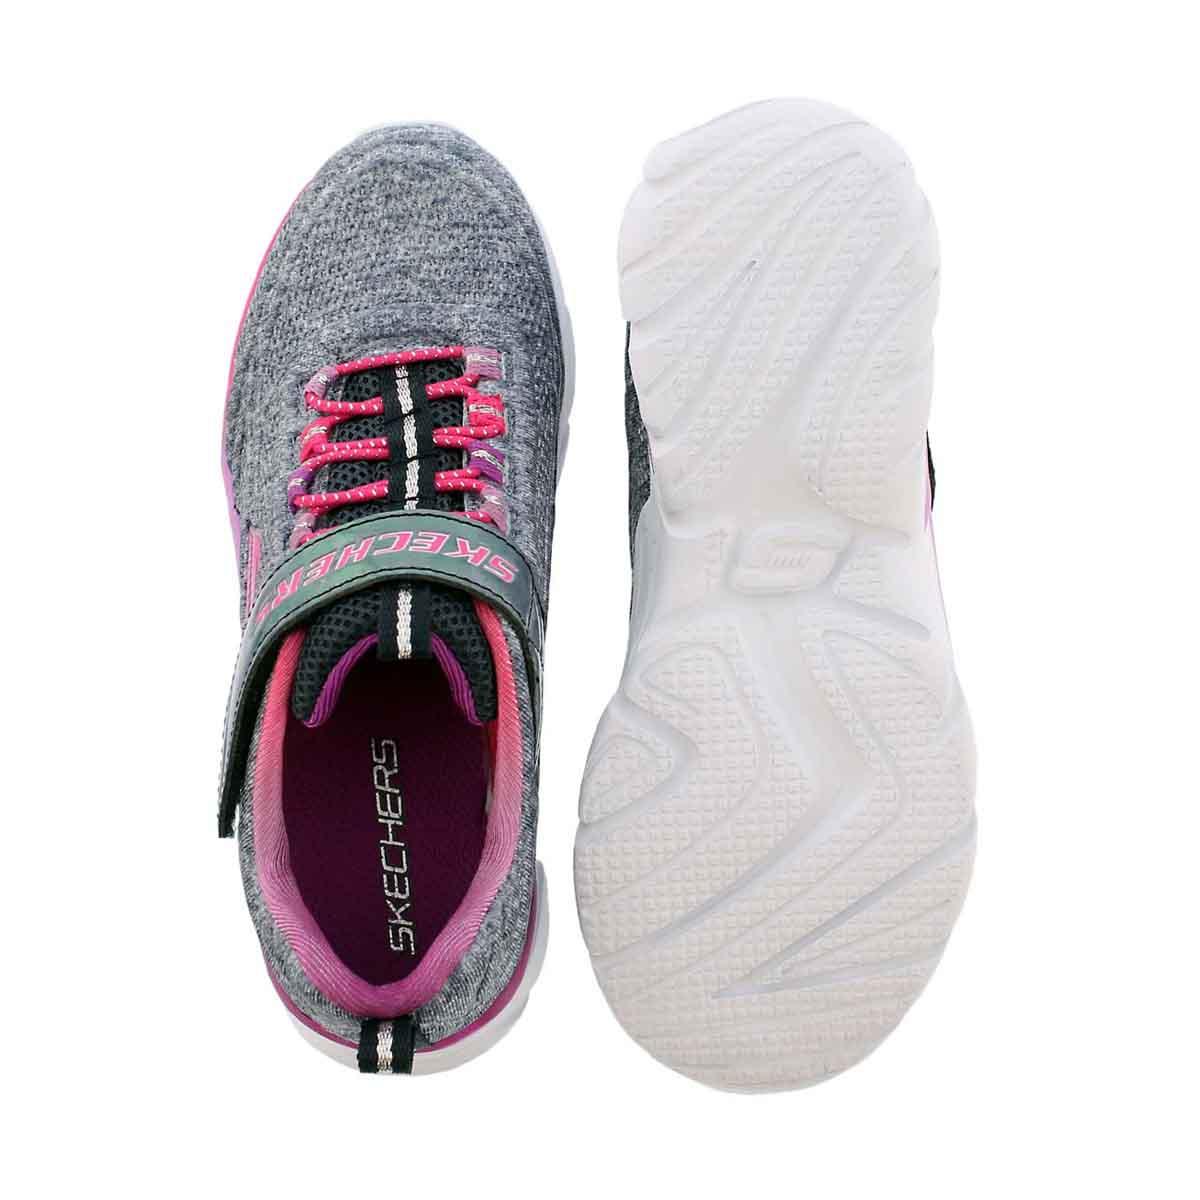 Grls Swirly Girl navy/pnk sneaker